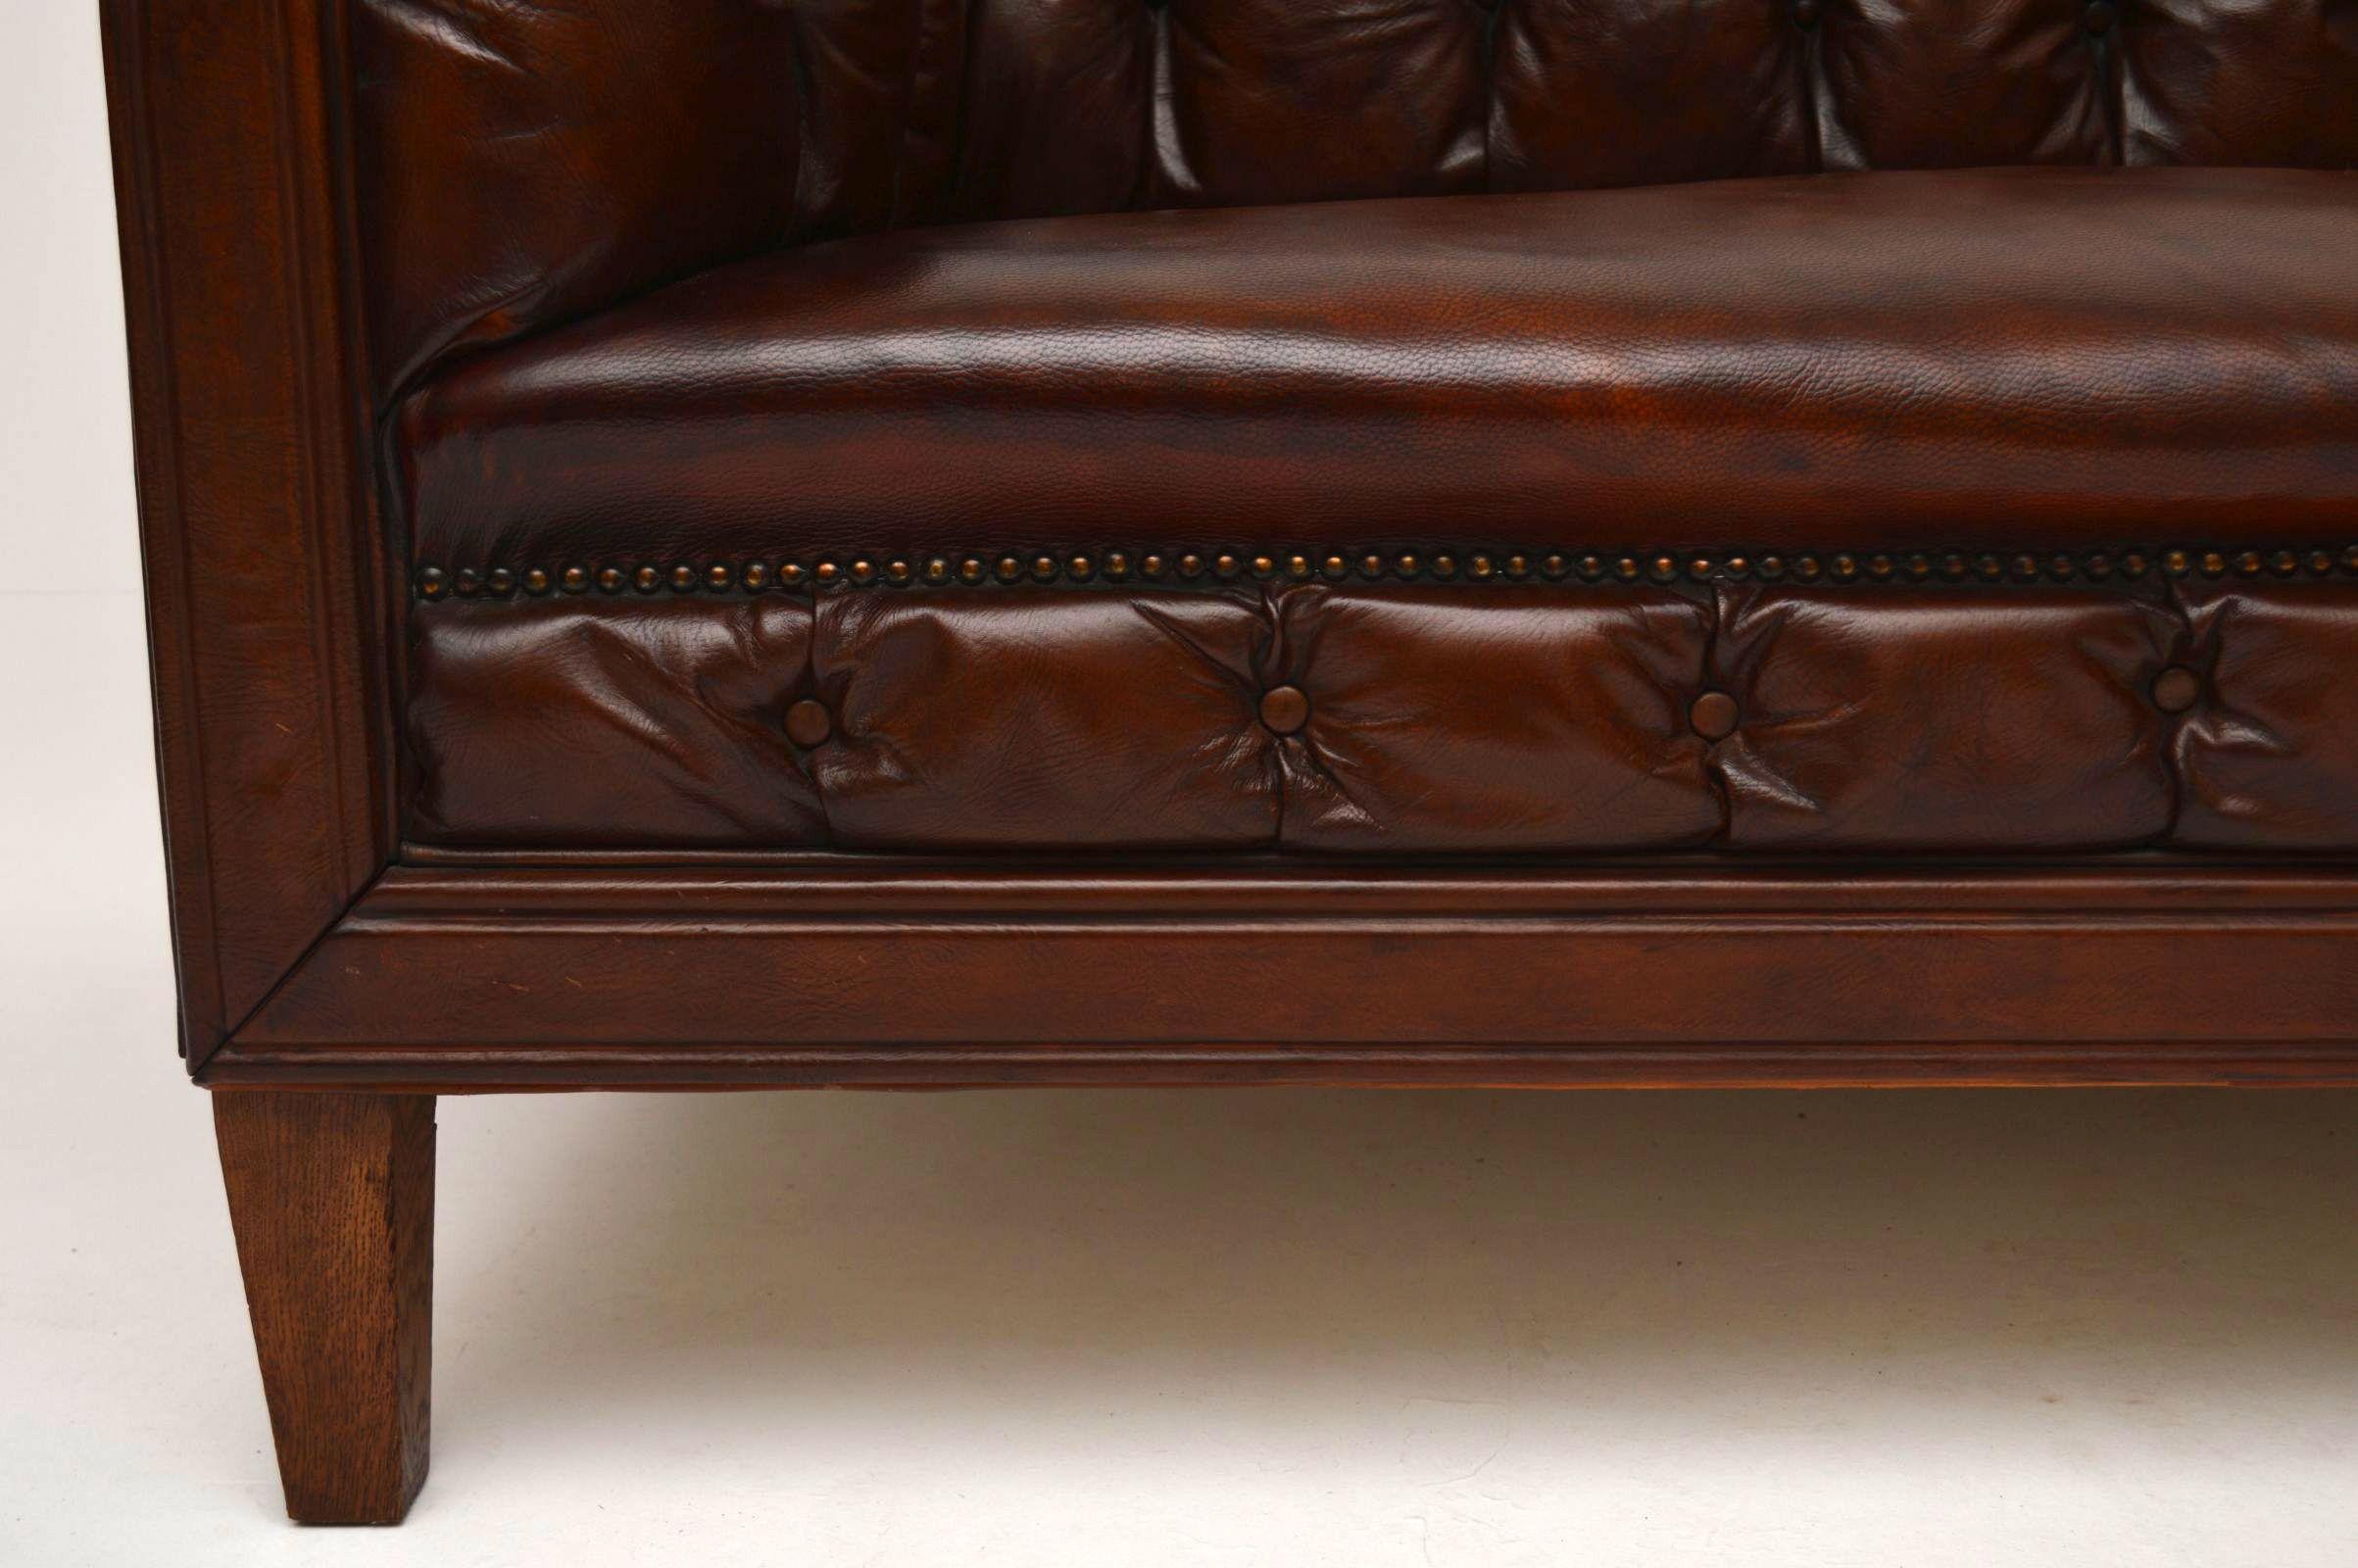 leather chesterfield sofa for sale milano grey corner antique swedish interior